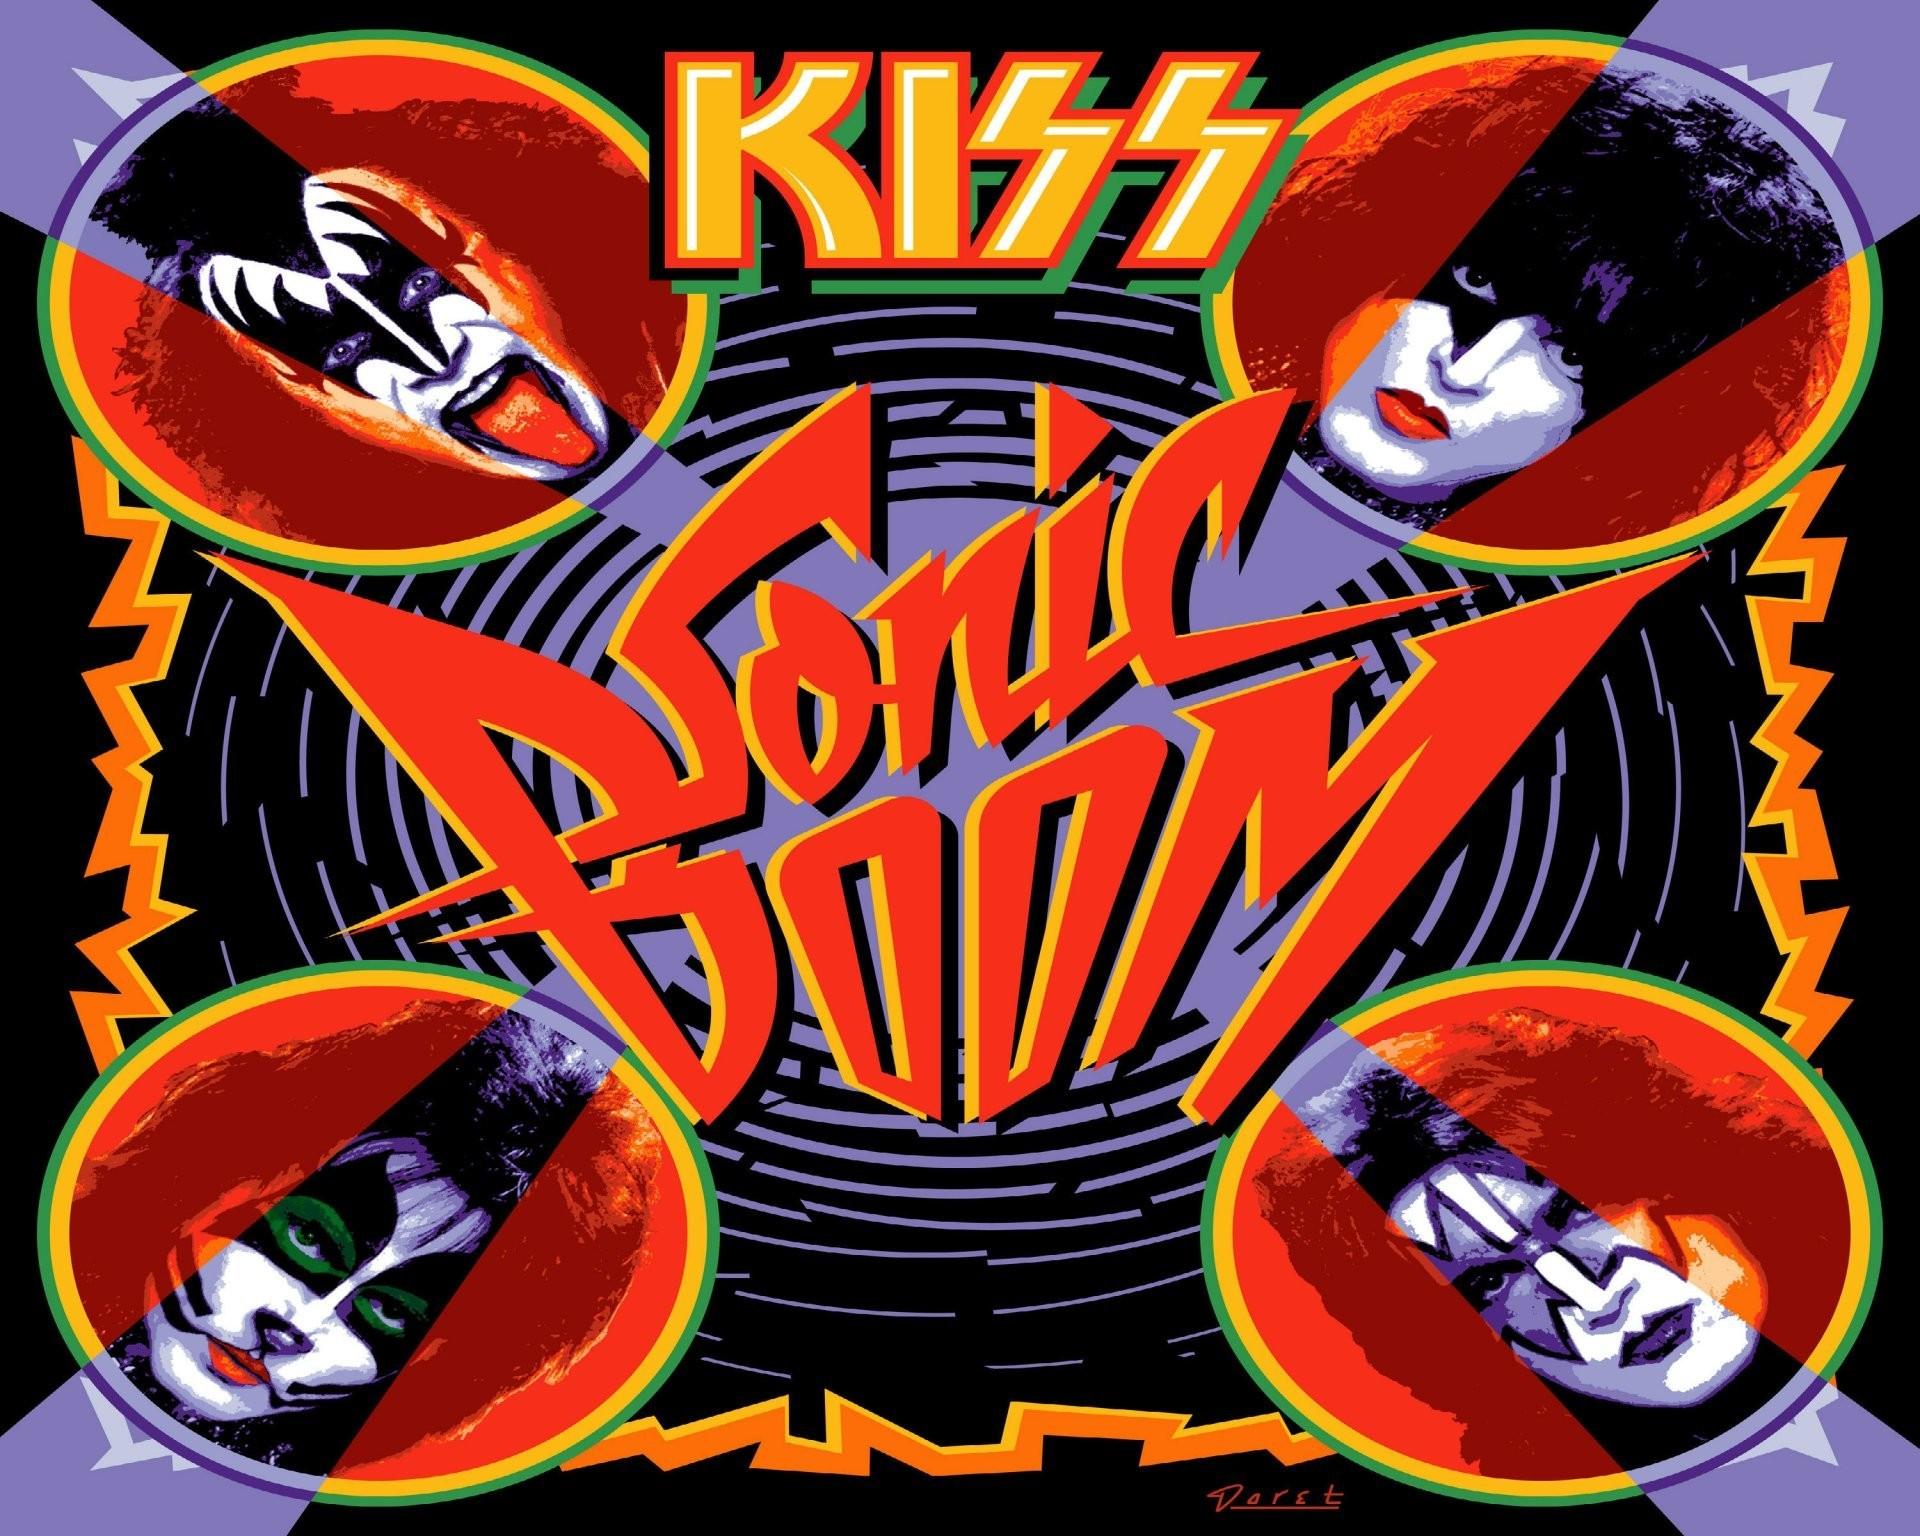 kiss kiss american rock band hard rock heavy metal poster